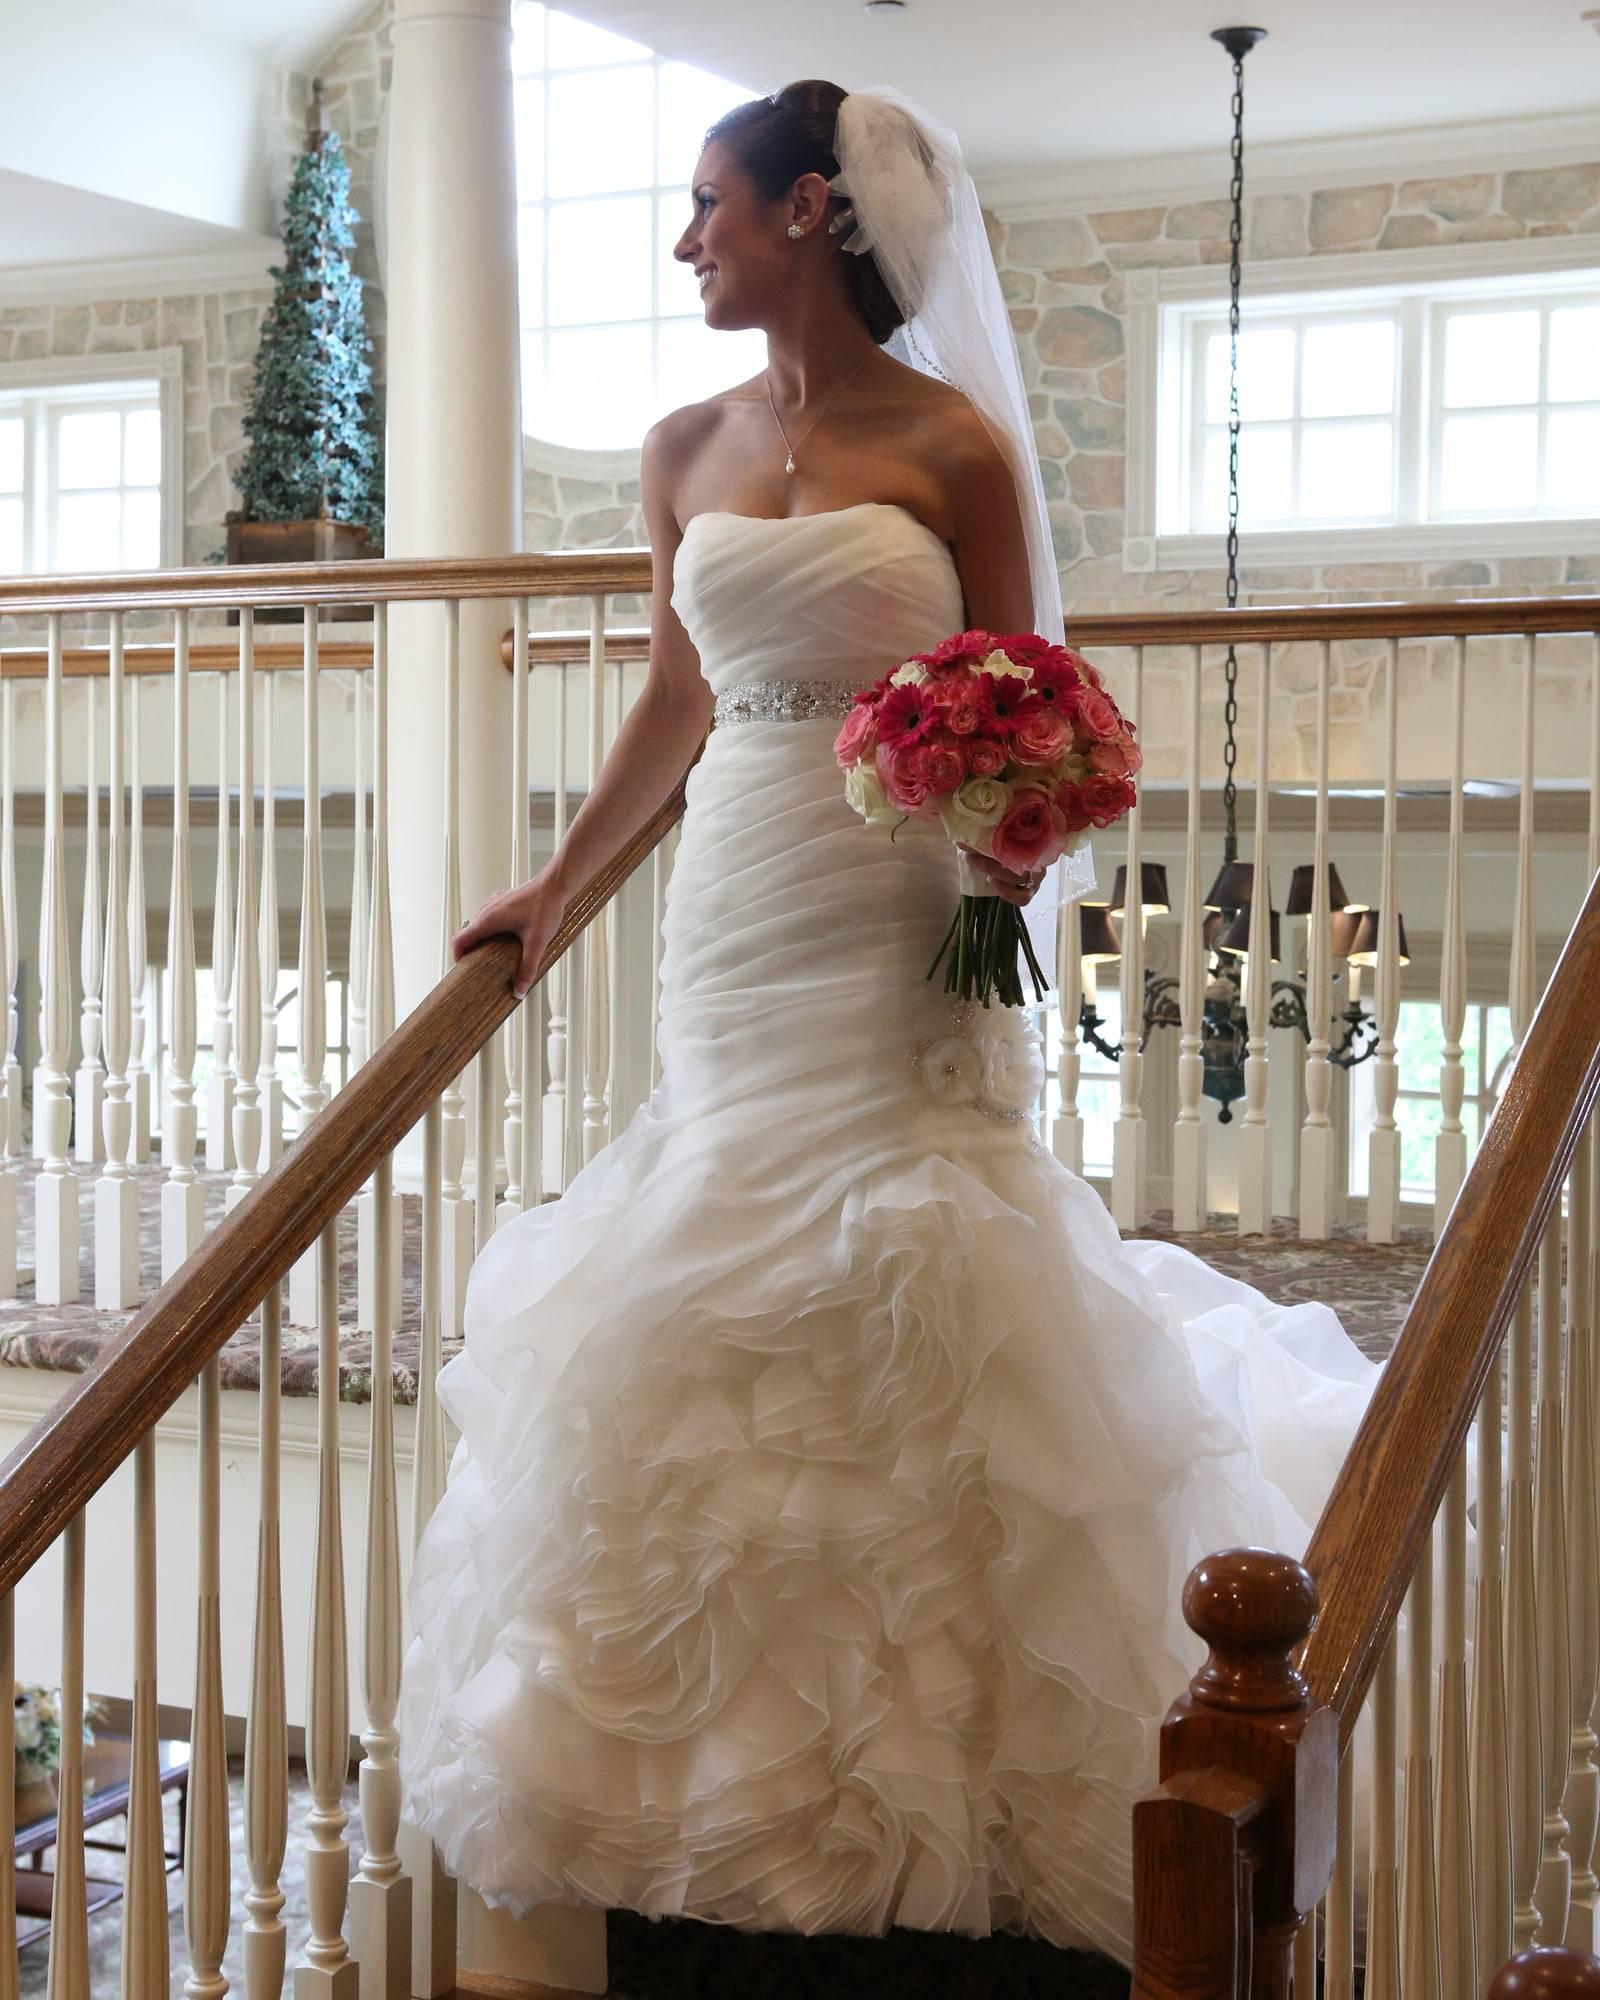 Olde Mill Inn bride on steps